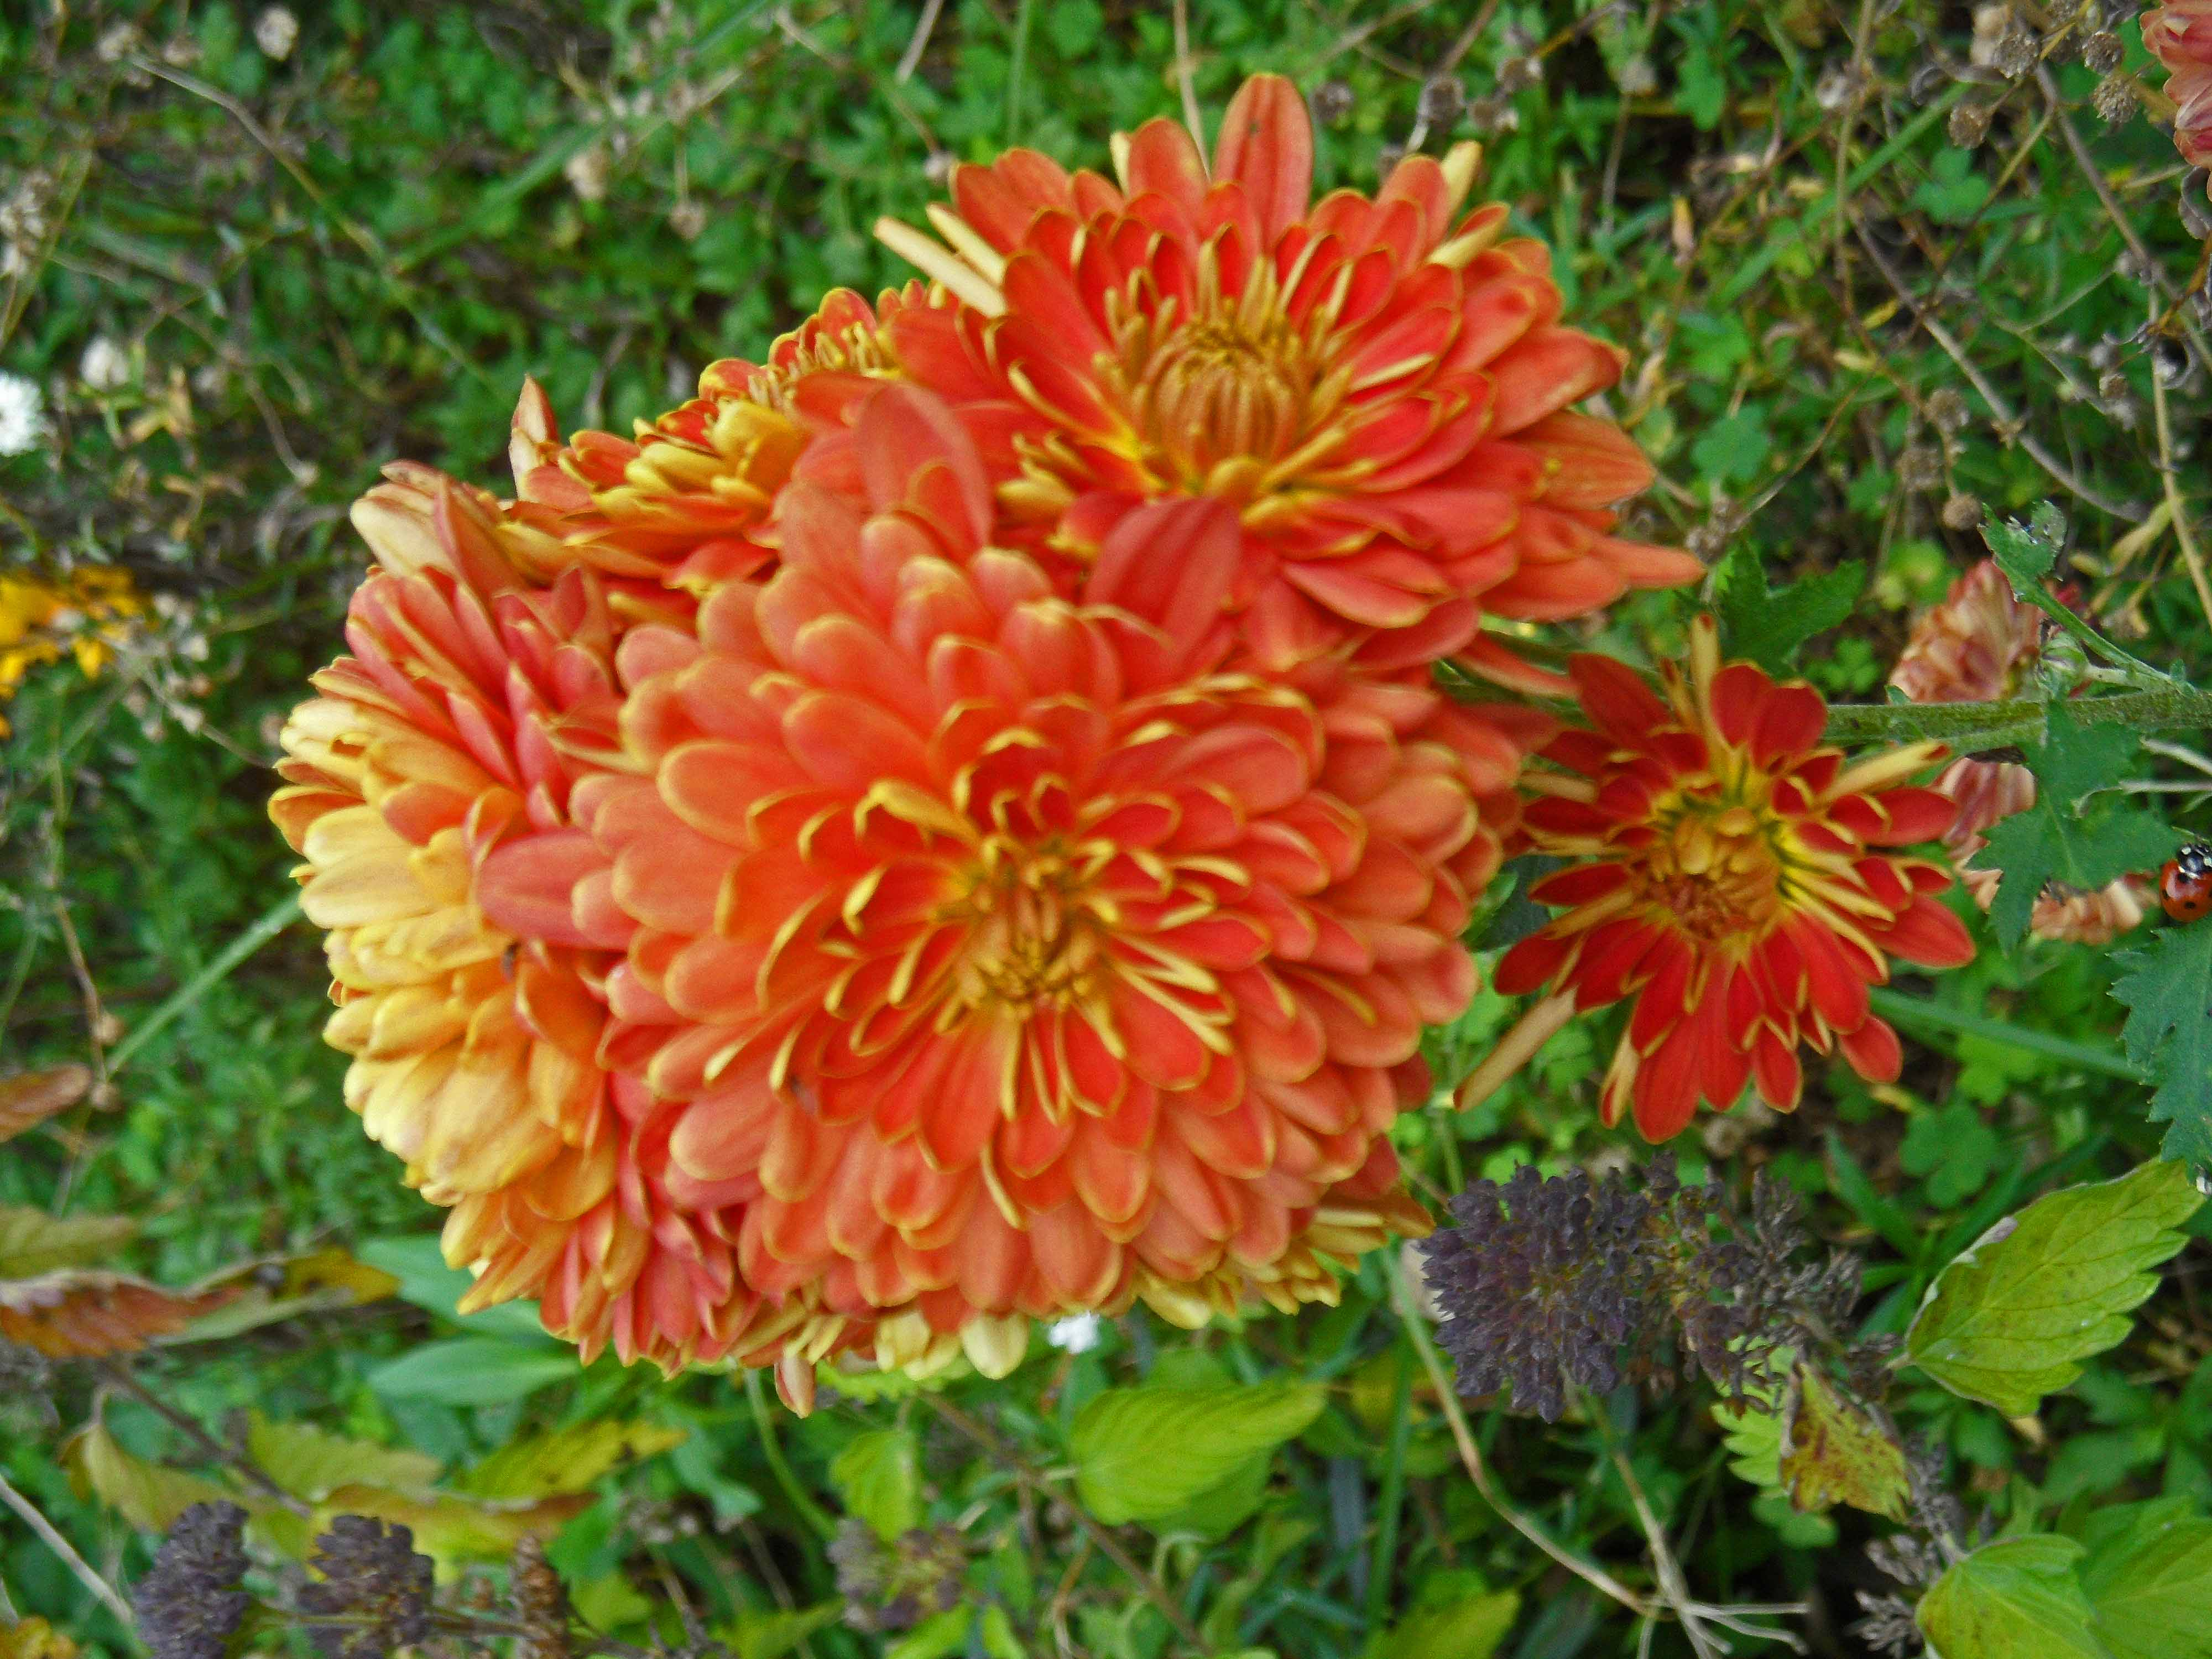 Chrysanthemum Chelsea Physic Garden 1115